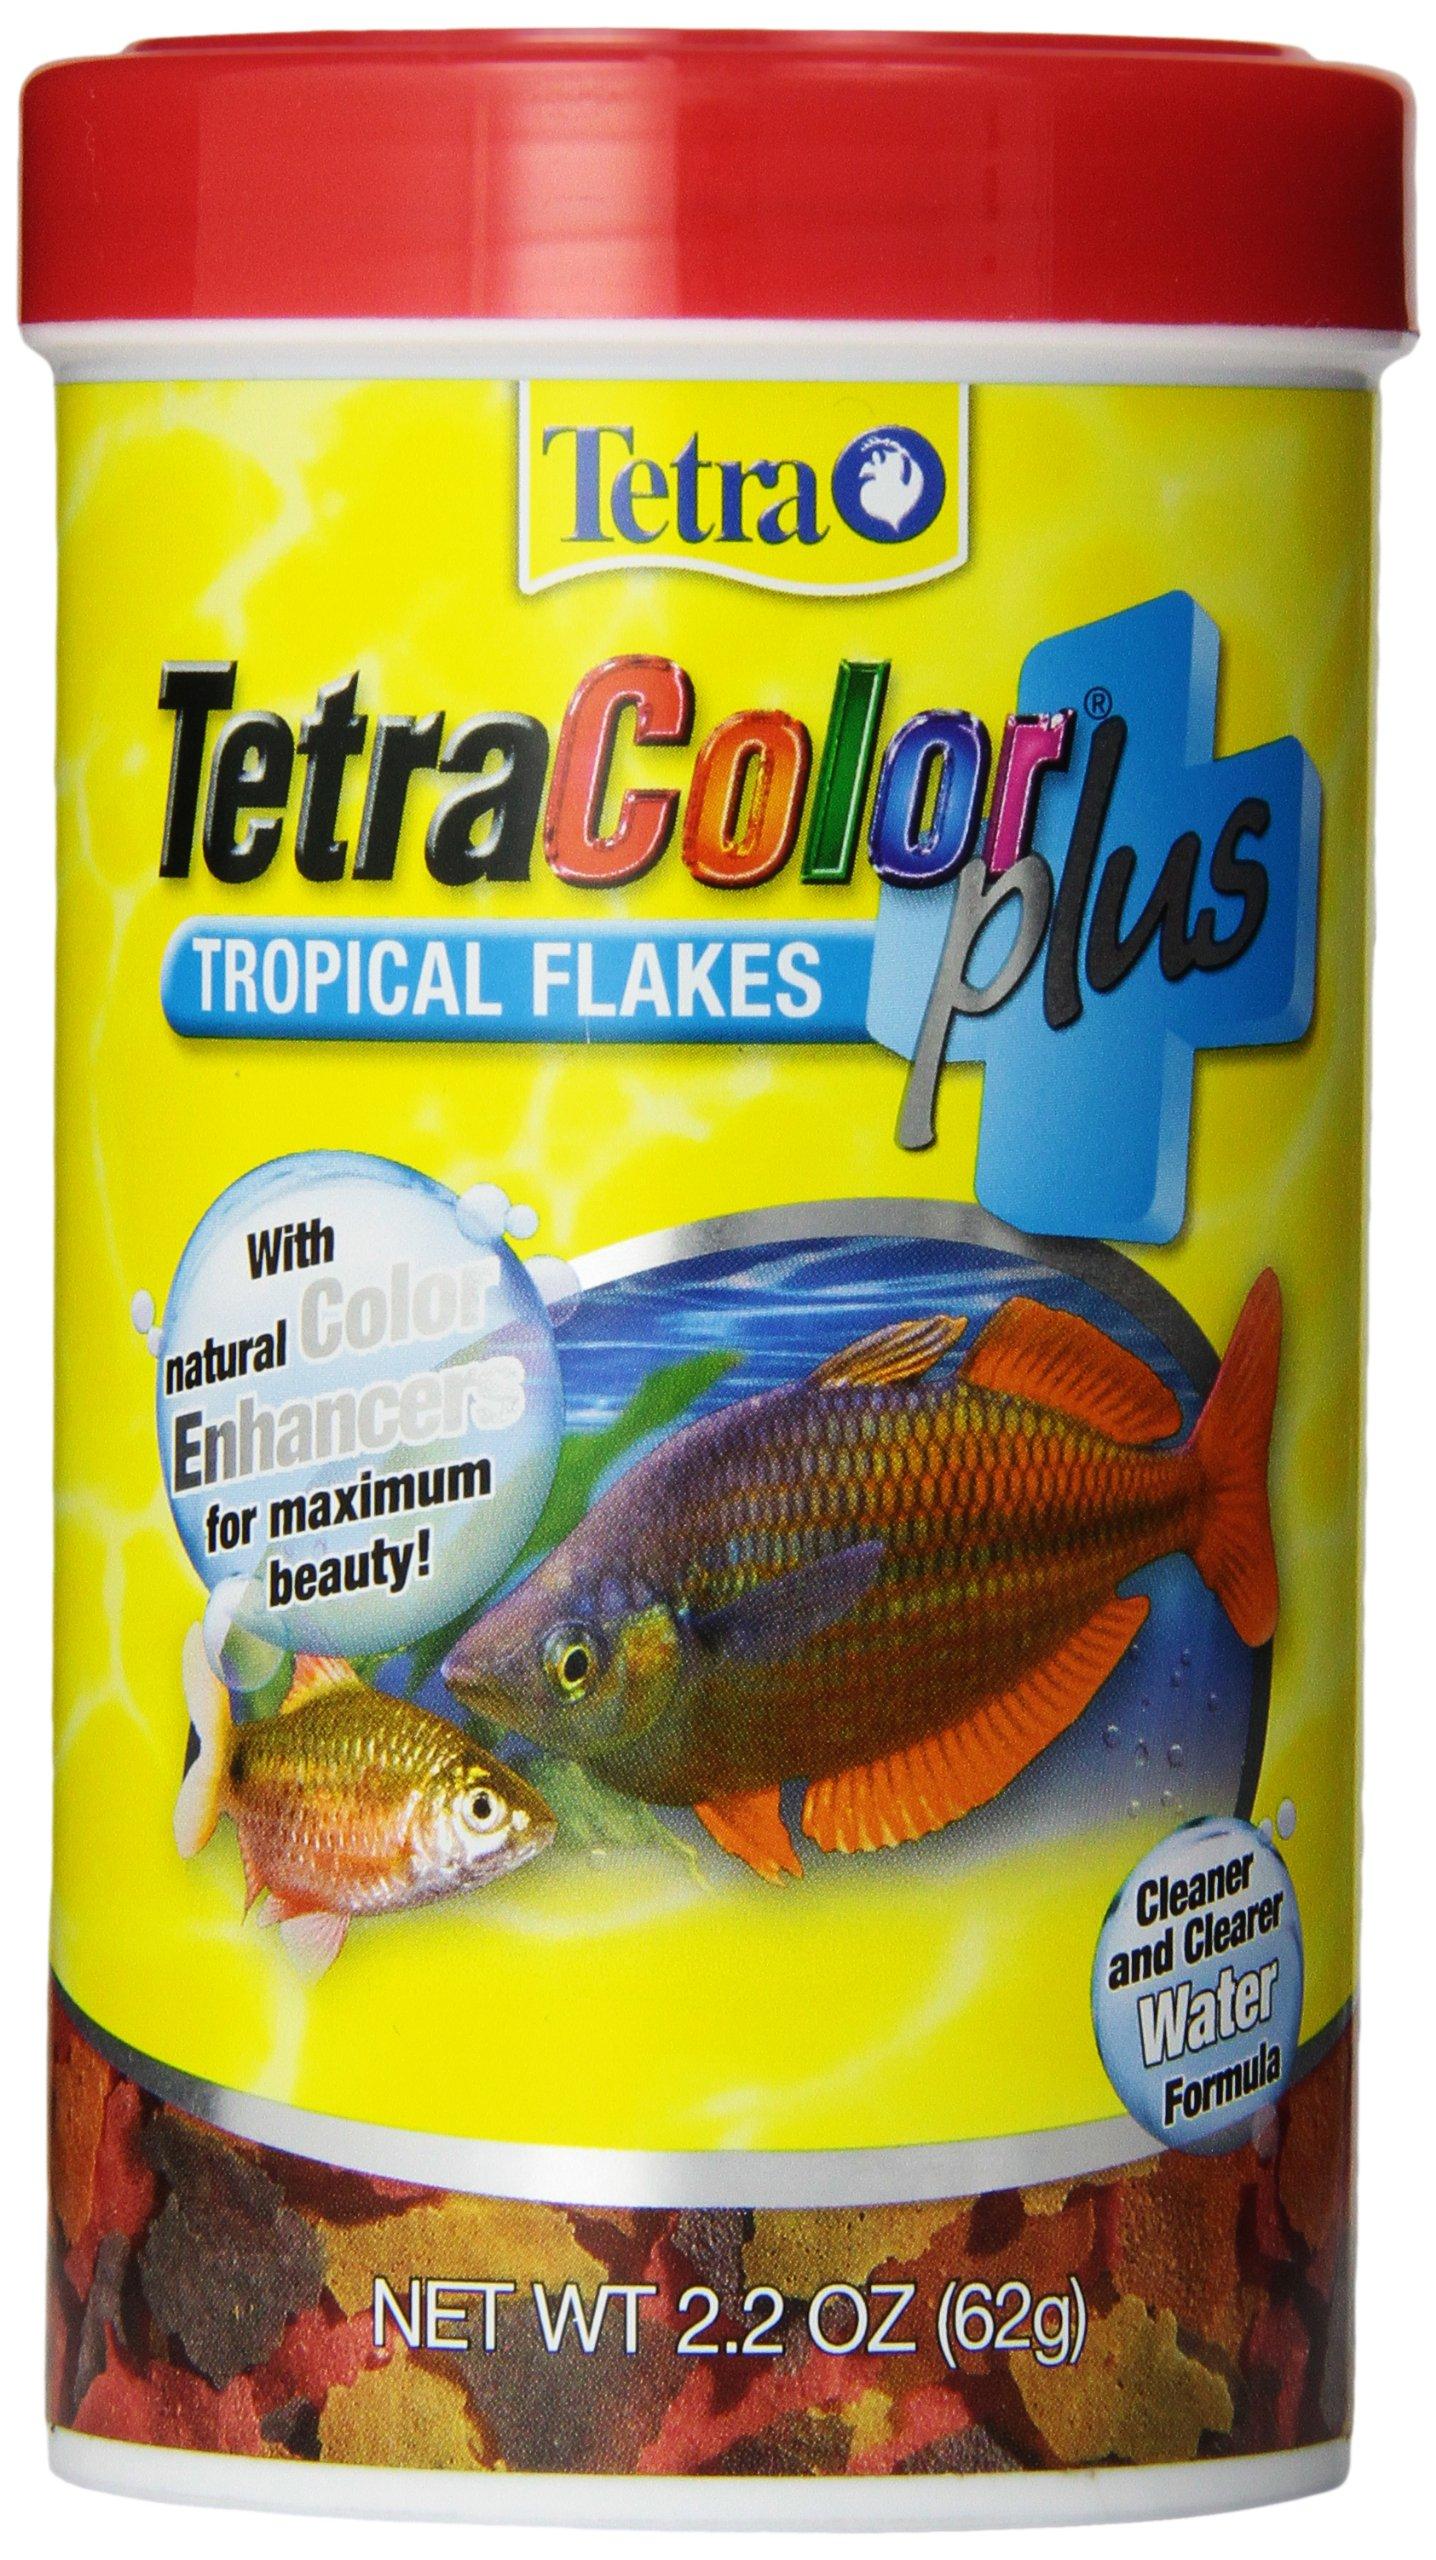 Tetra Color Plus Tropical Flakes Fish Food, 2.2-oz